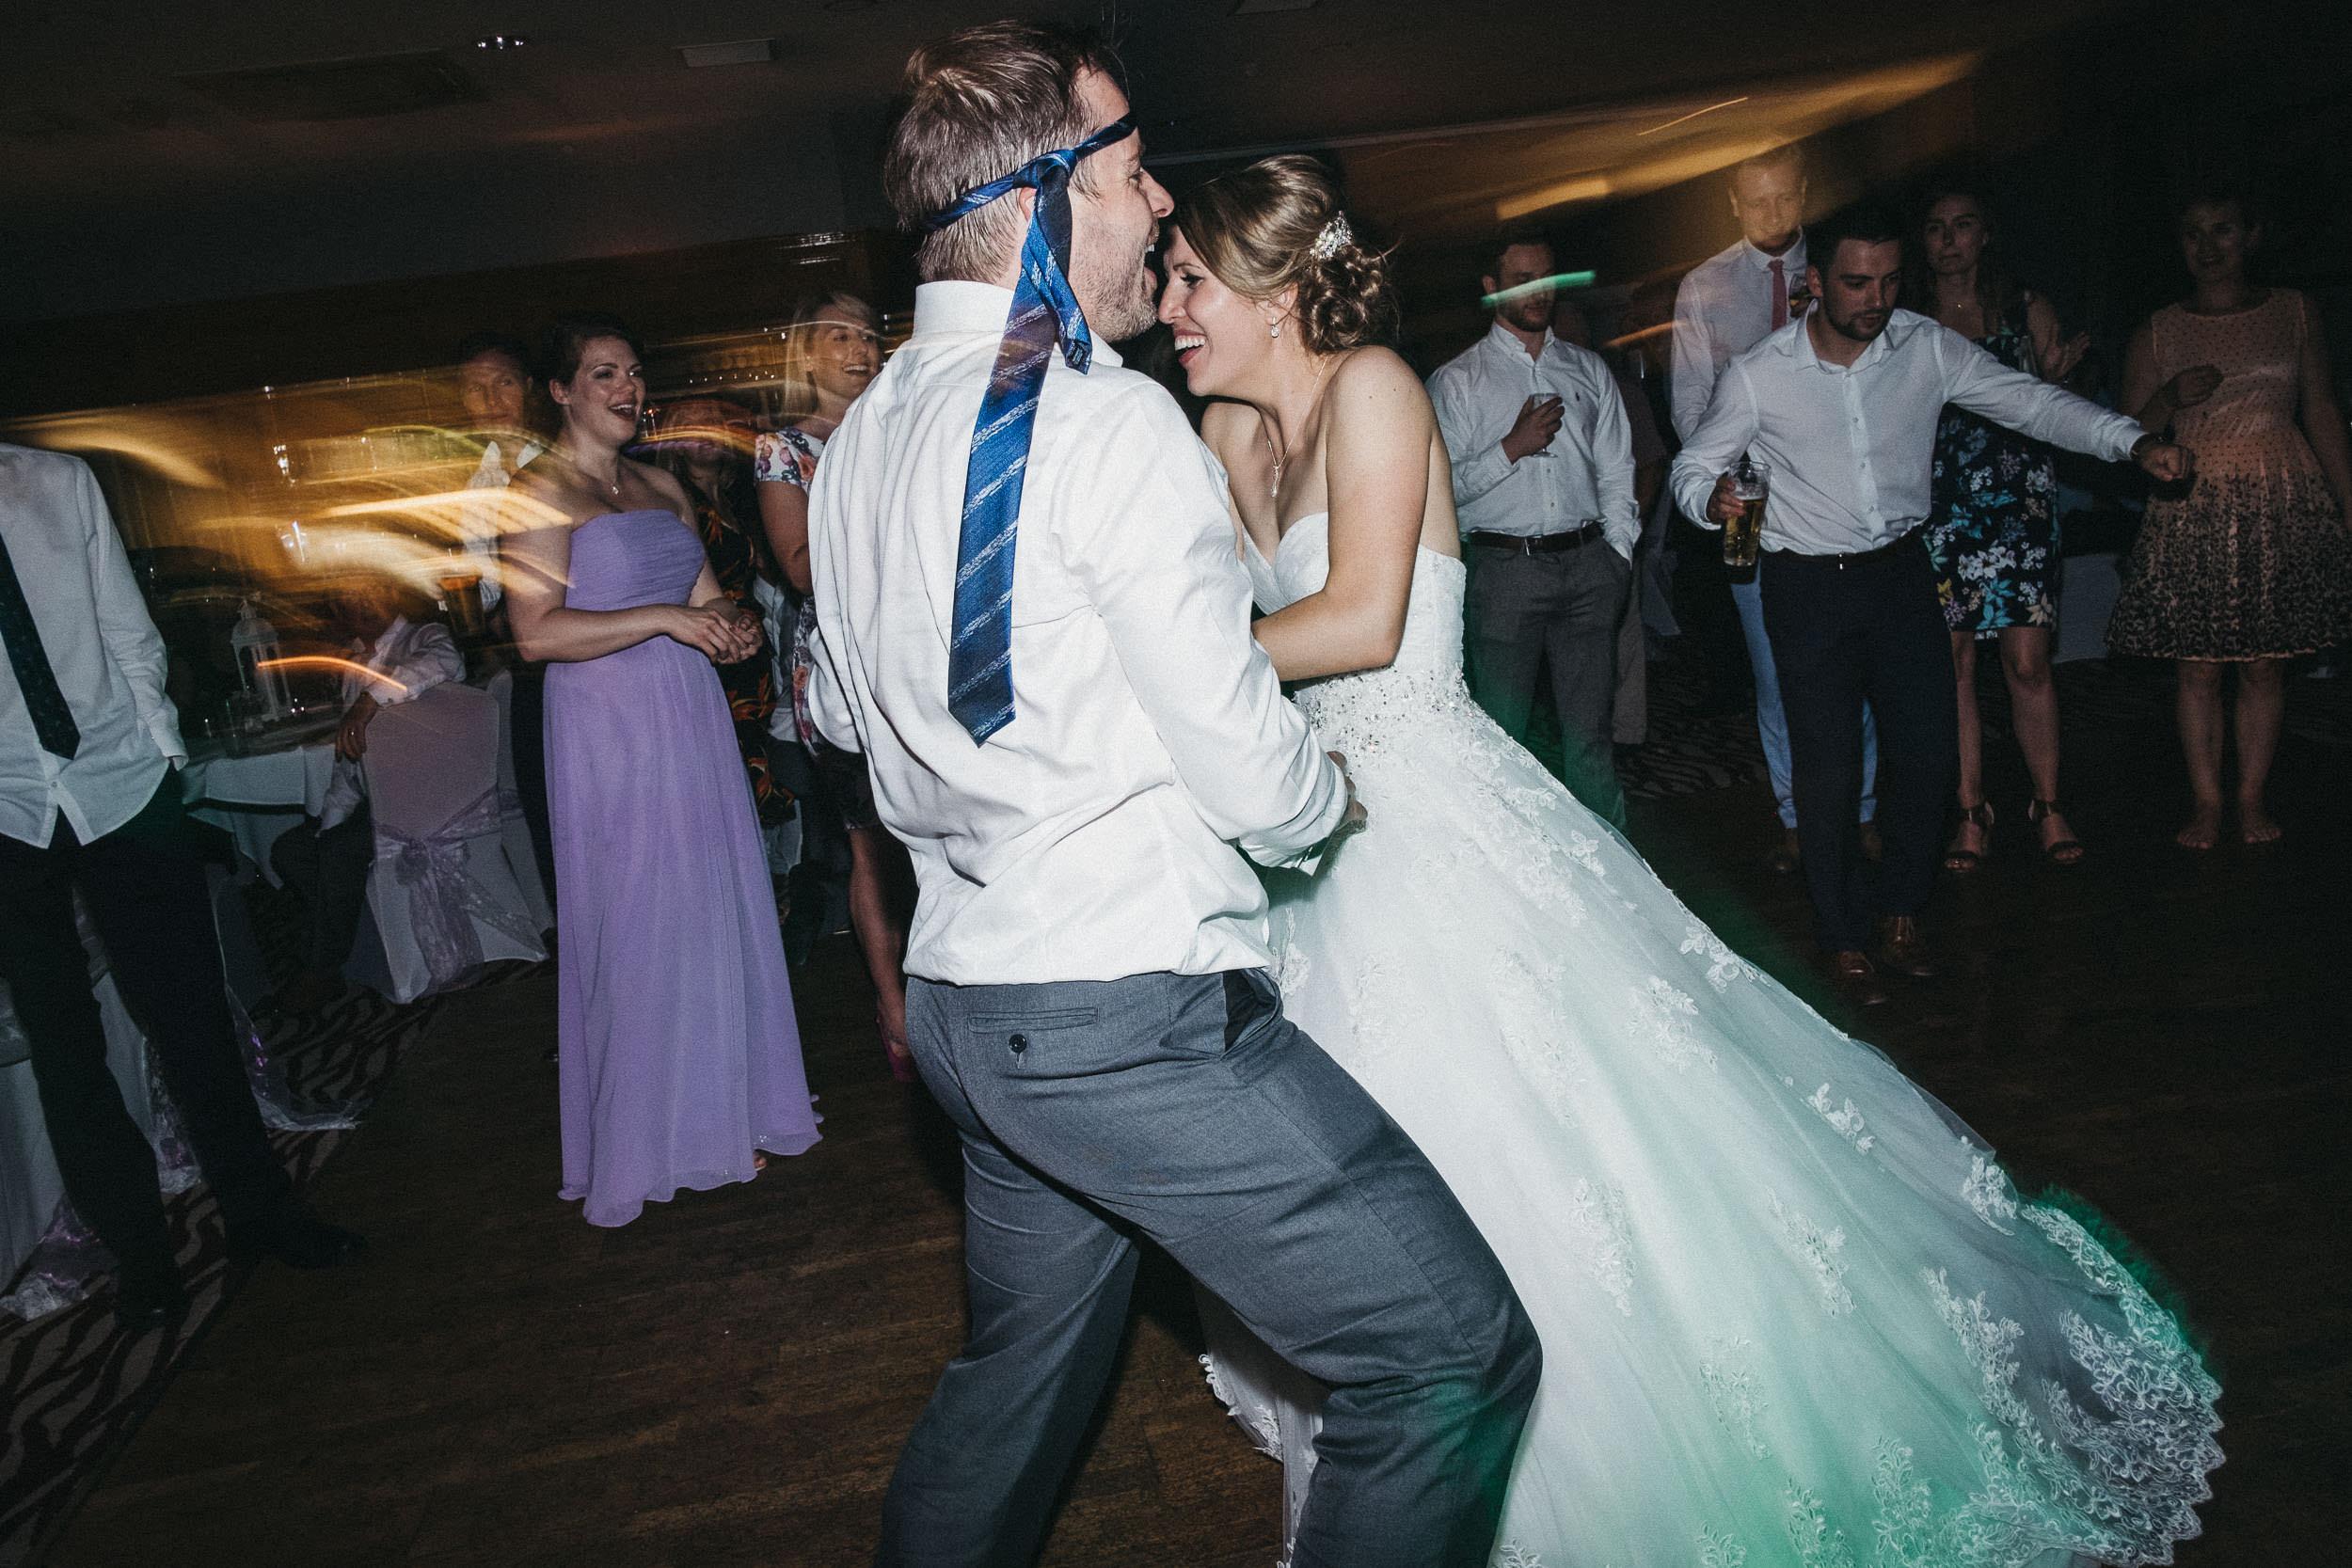 Groomsman dances with bride with tie tied around his head